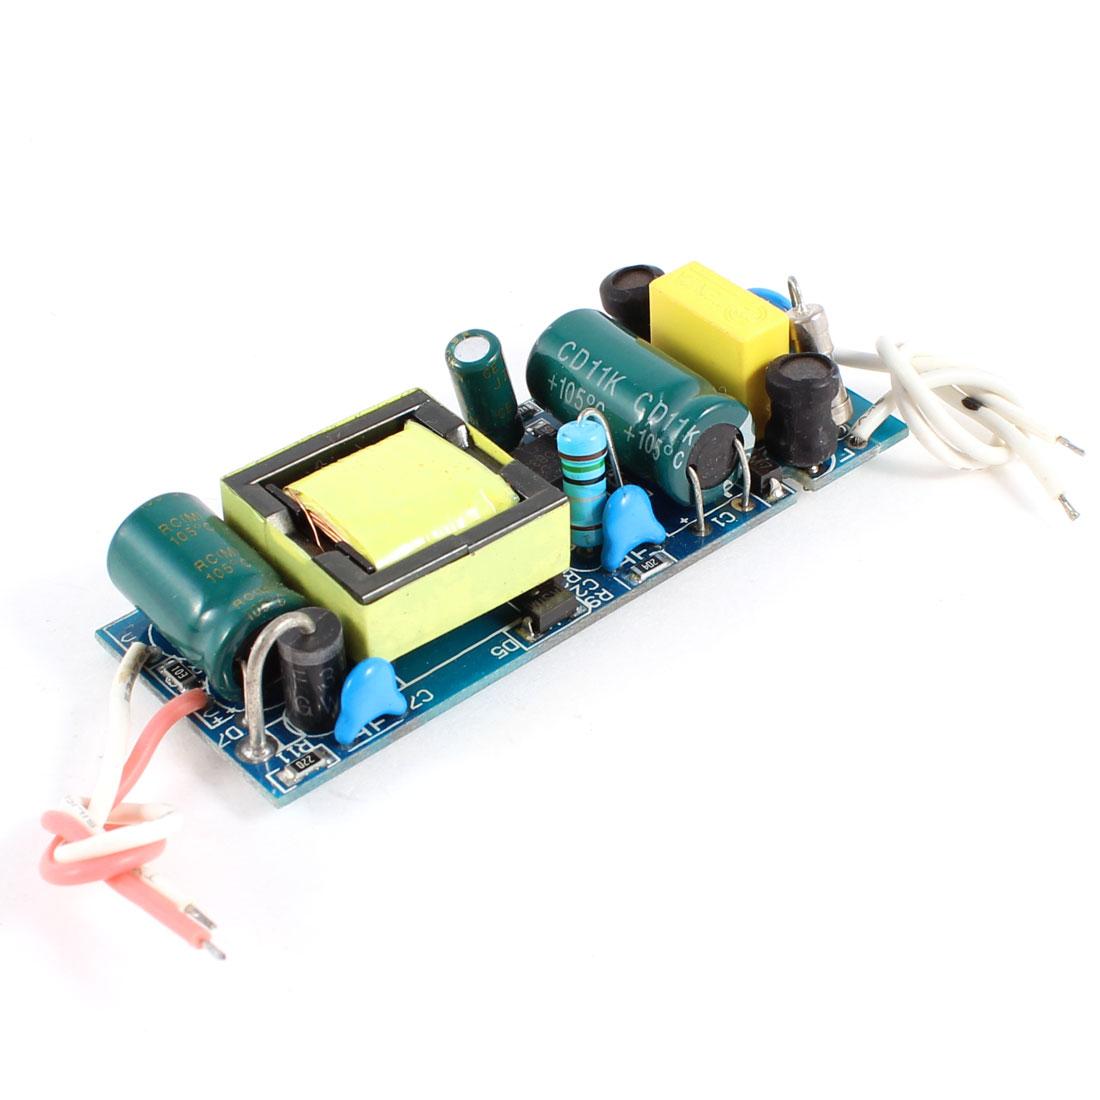 AC 85-265V Power Supply Transformer for 12W-18W LED Light